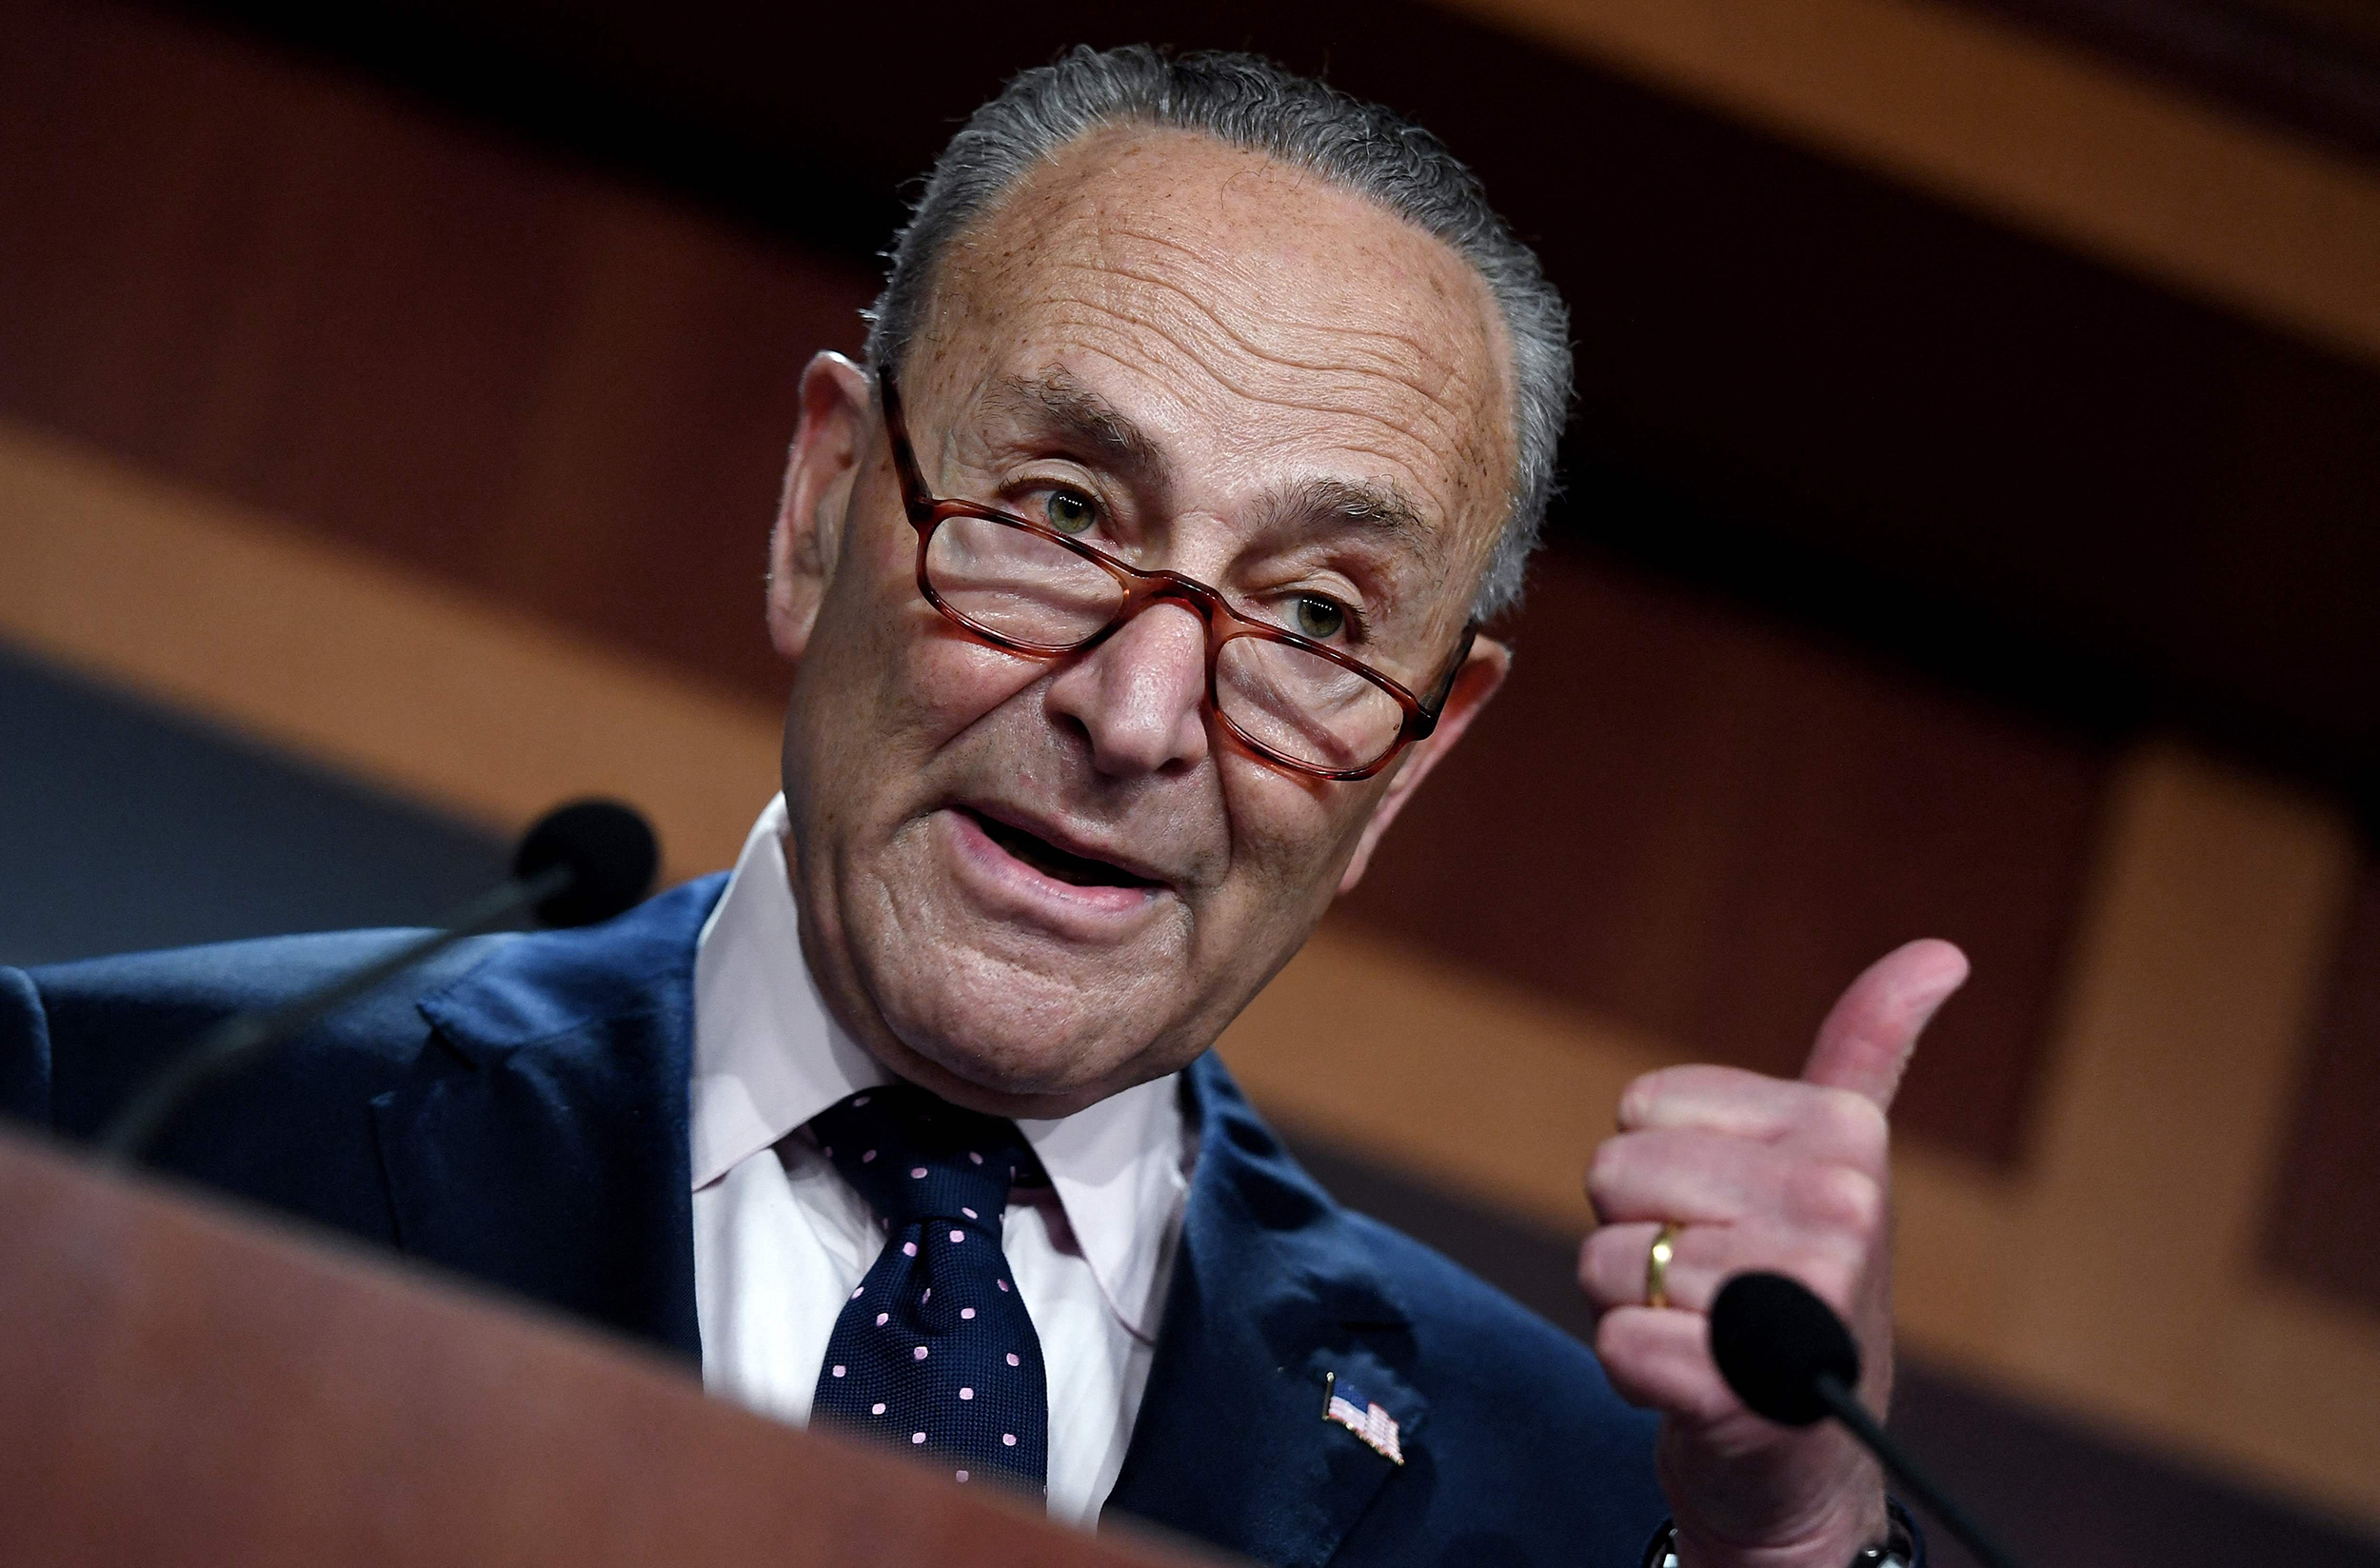 Senate reaches deal to avoid government shutdown, Schumer announces